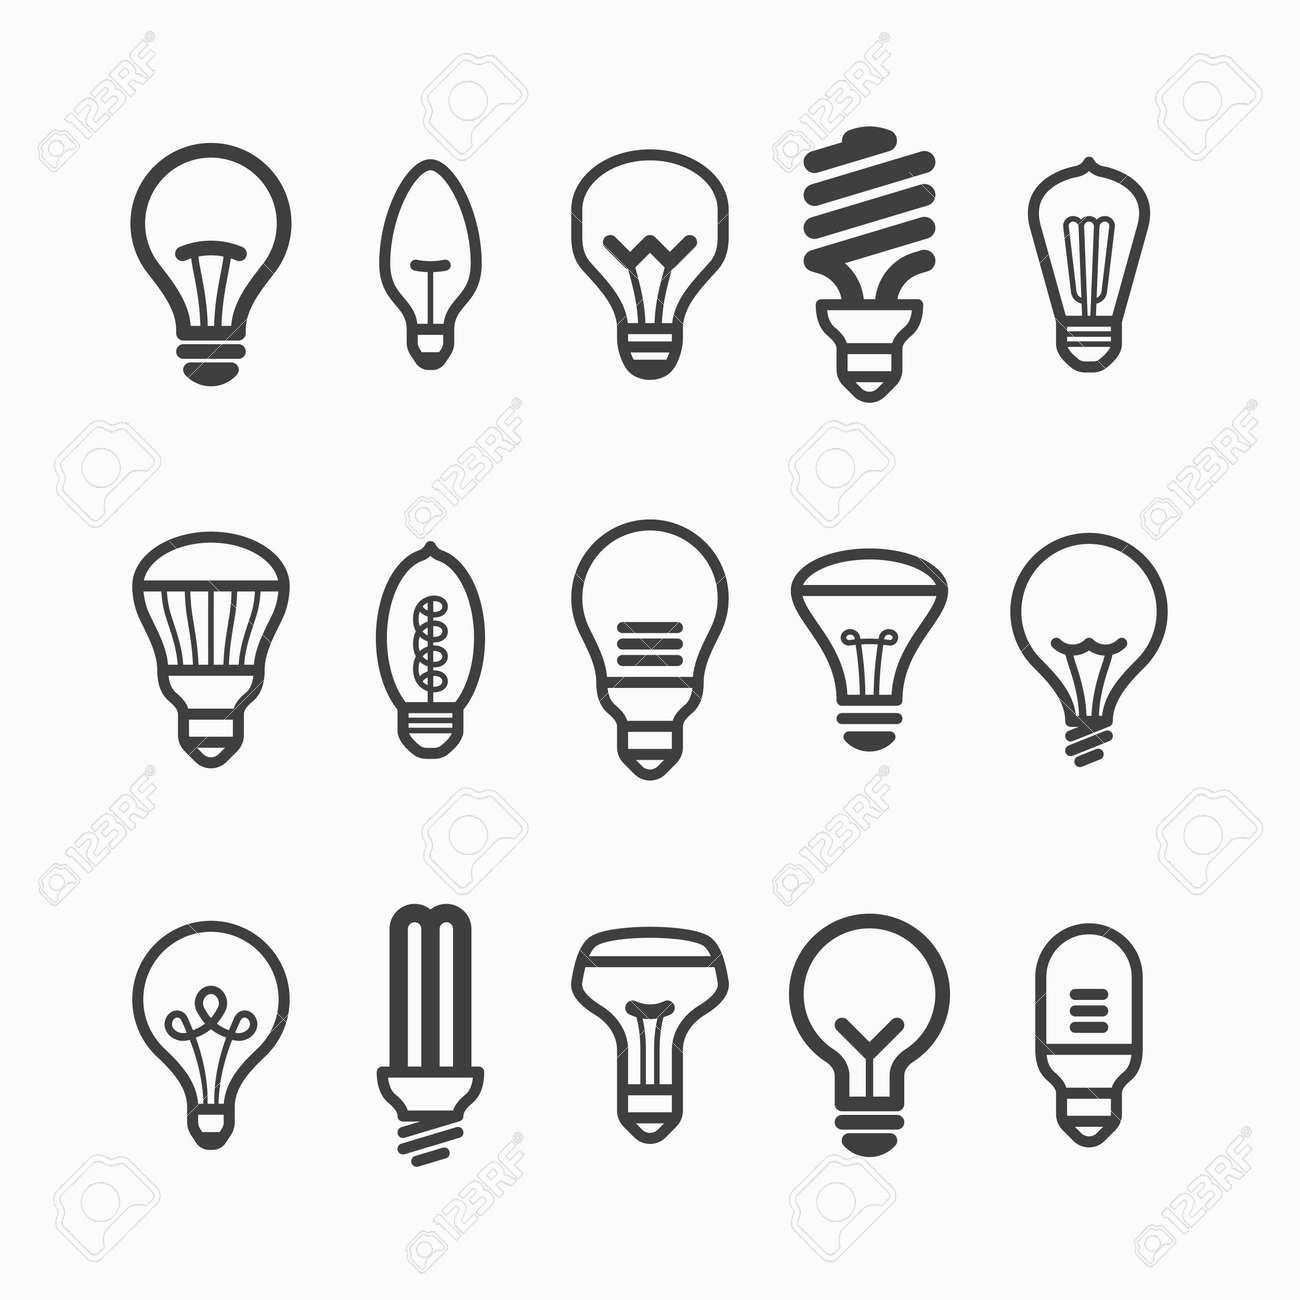 Light bulb icons - 27742128